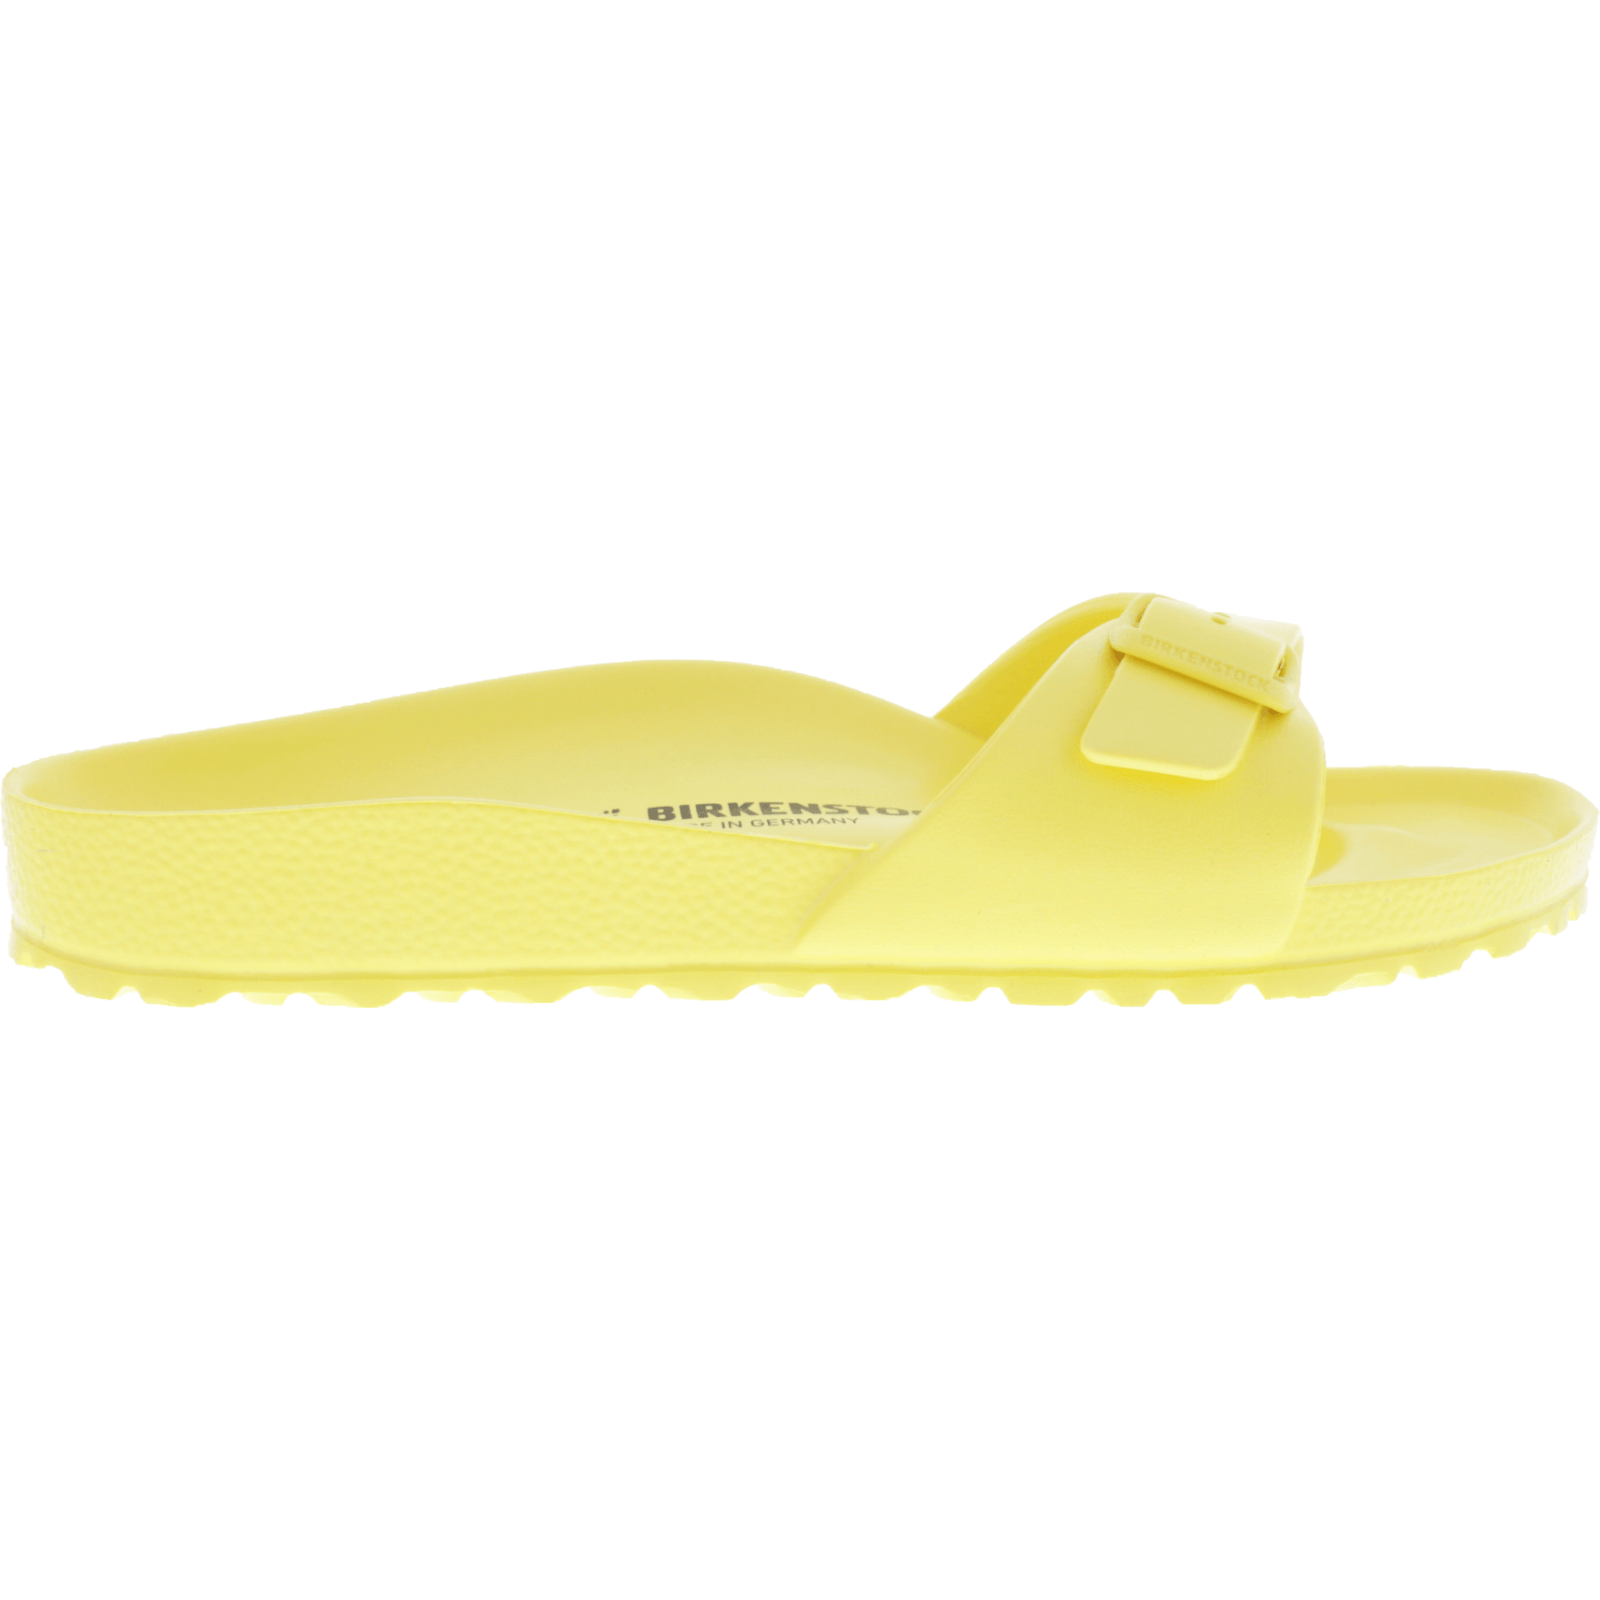 Birkenstock Modell: EVA Madrid Vibrant Yellow EVA Weite: Schmal Art: 1014562 Badeschuhe